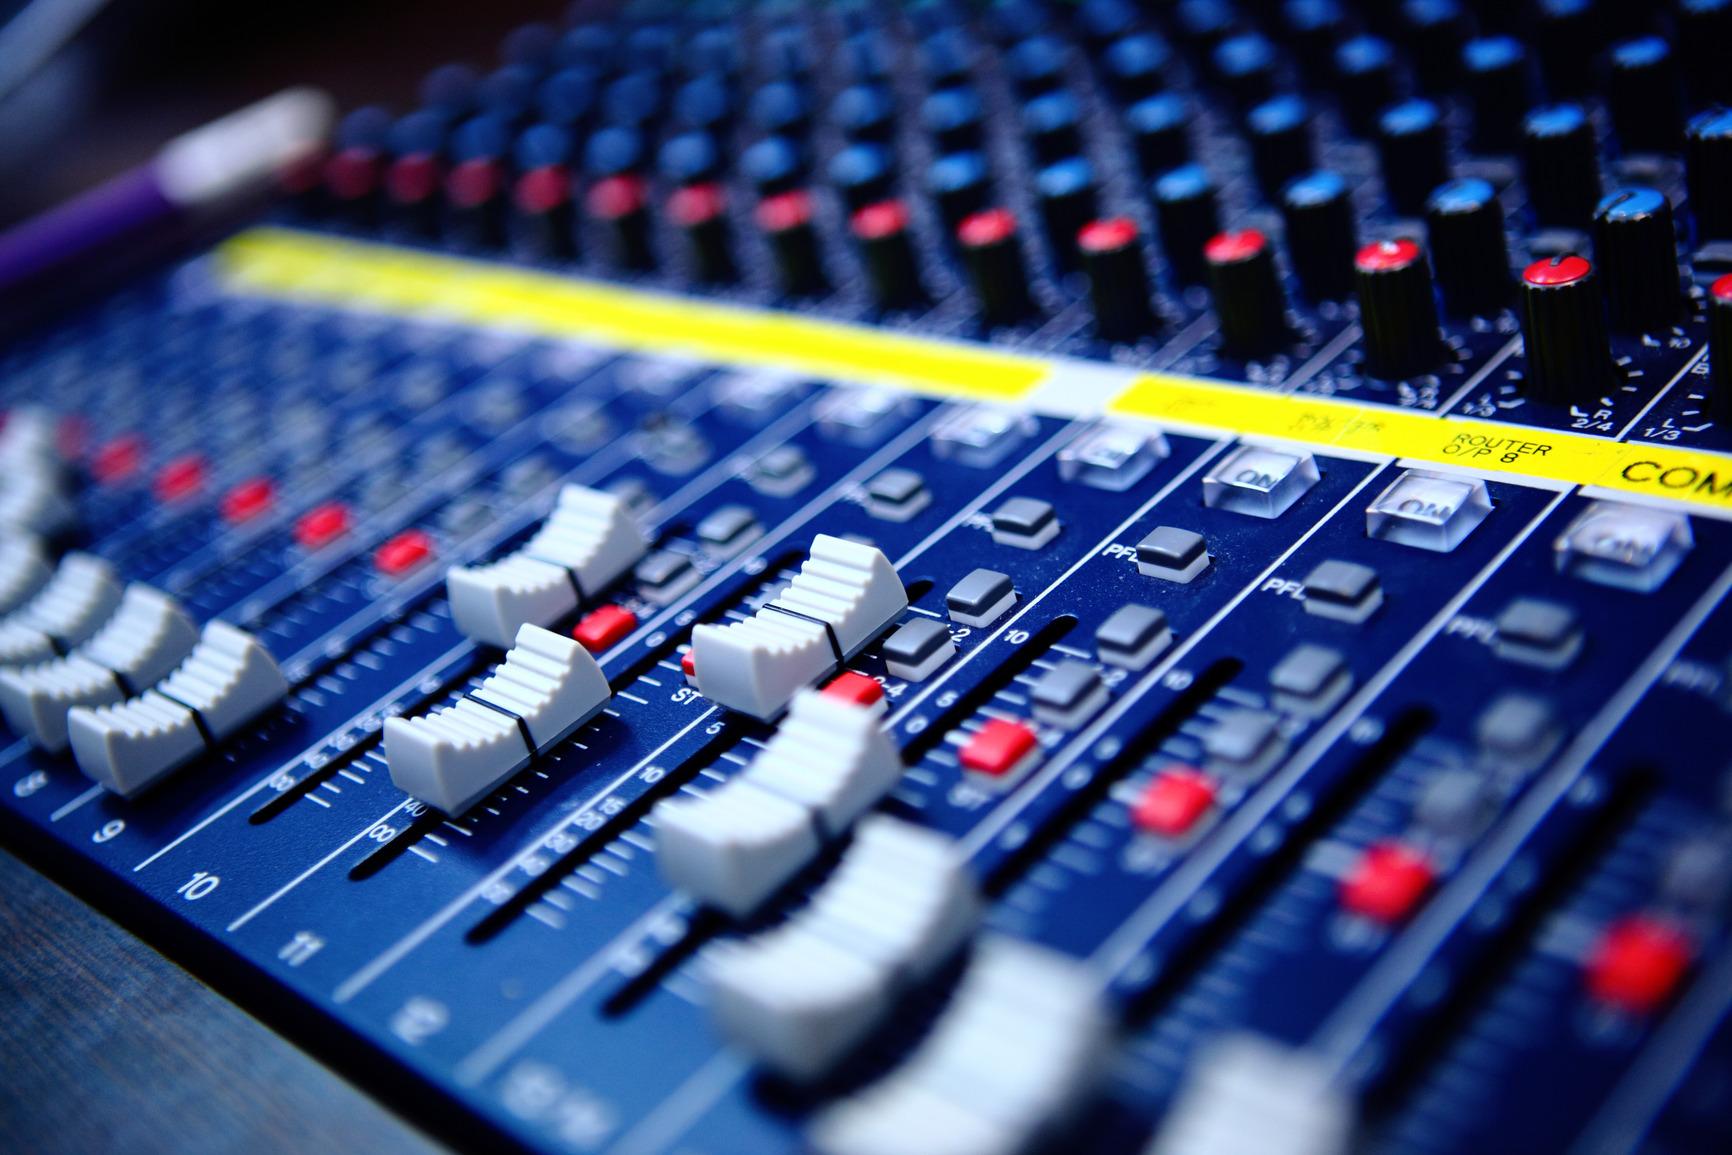 146122 photodune 2783179 controls of audio mixing console m f45863 original 1414038844